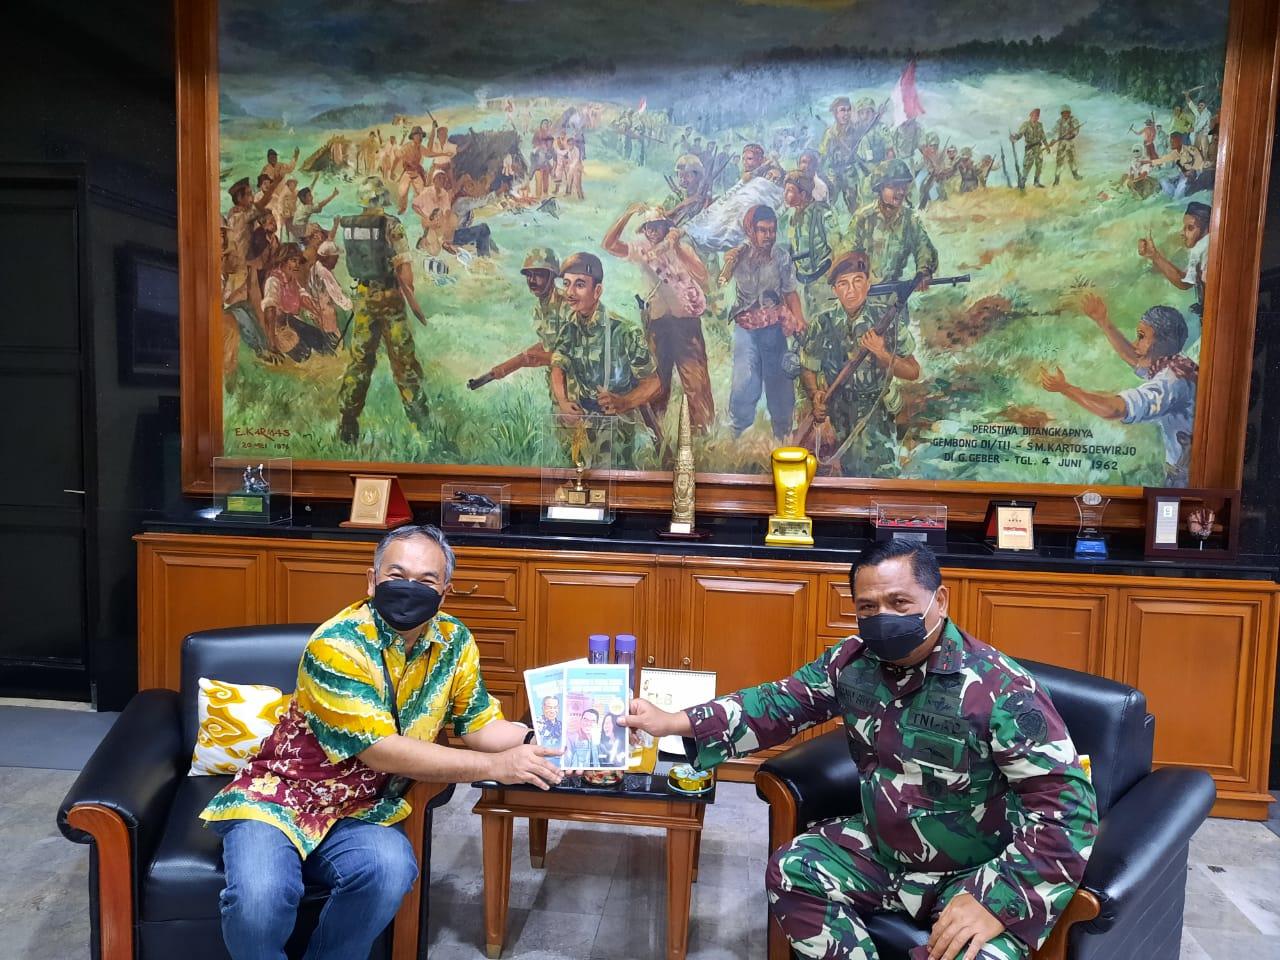 Pangdam III/Siliwangi Mayjen TNI Nugroho Budi Wiryanto bersama Pakar Komunikasi dan Motivator Nasional, Dr Aqua Dwipayana. (Foto: Dokumen) tugu jatim